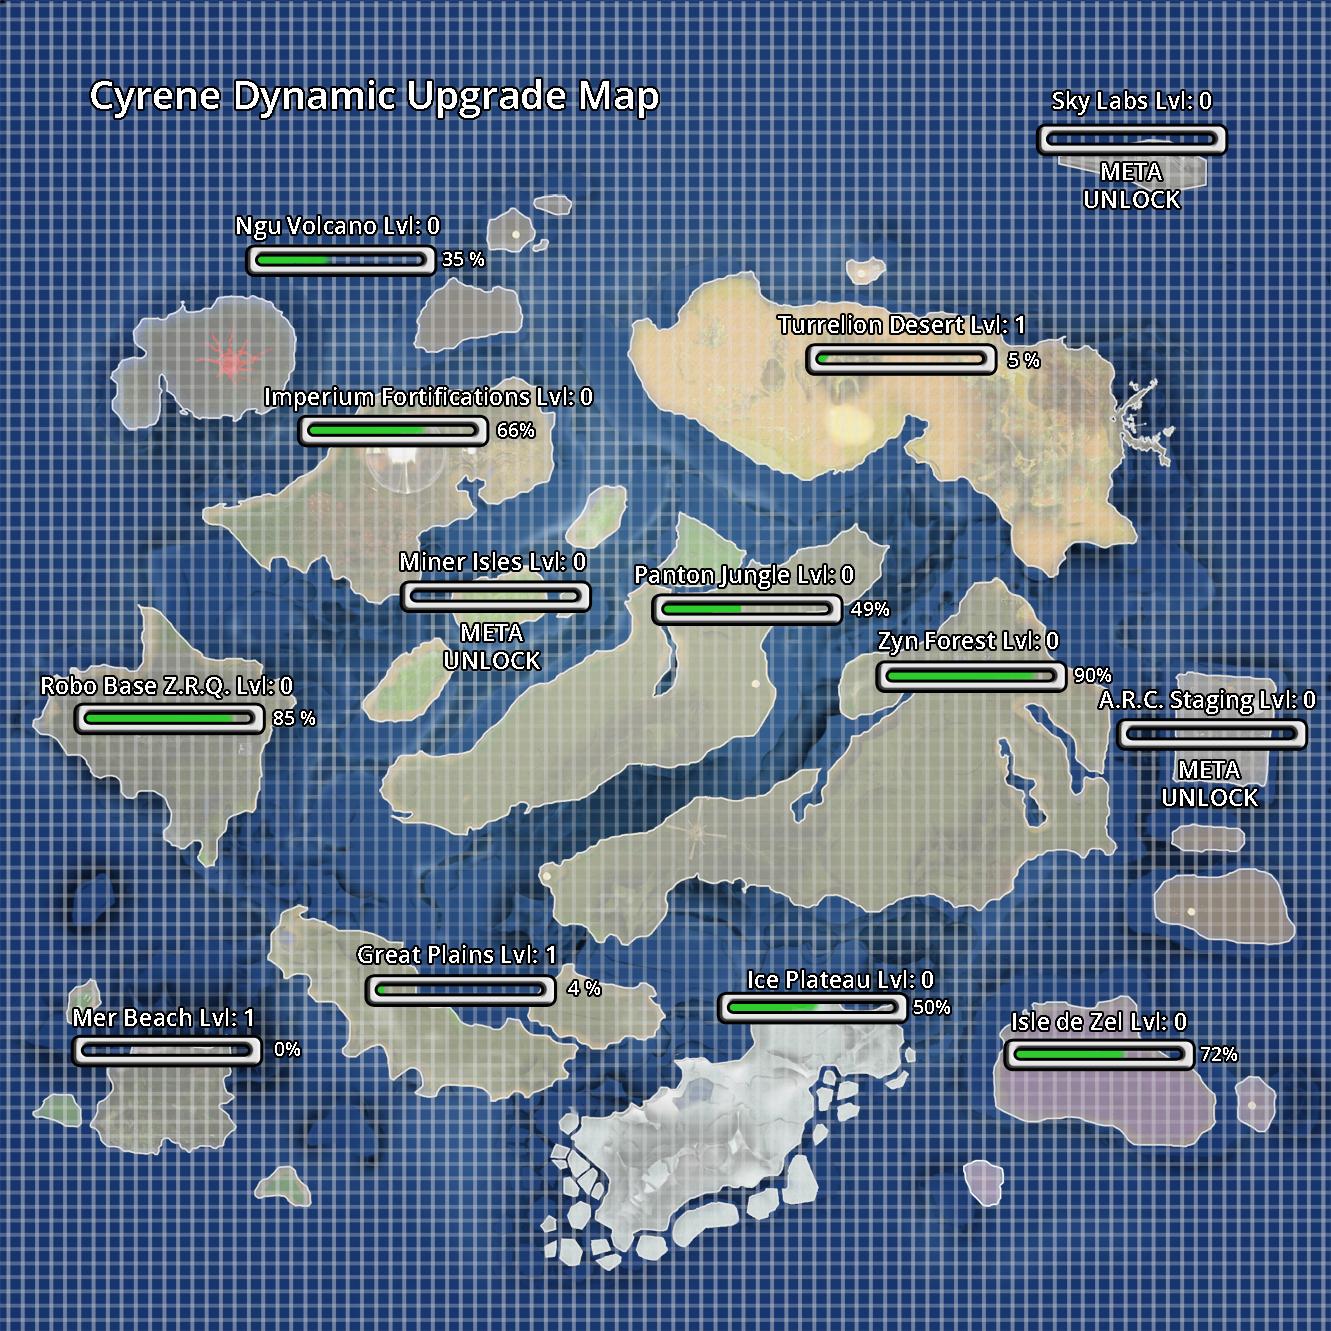 Cyrene_Dyanmic_Upgrade_Map_2_27_2015.jpg